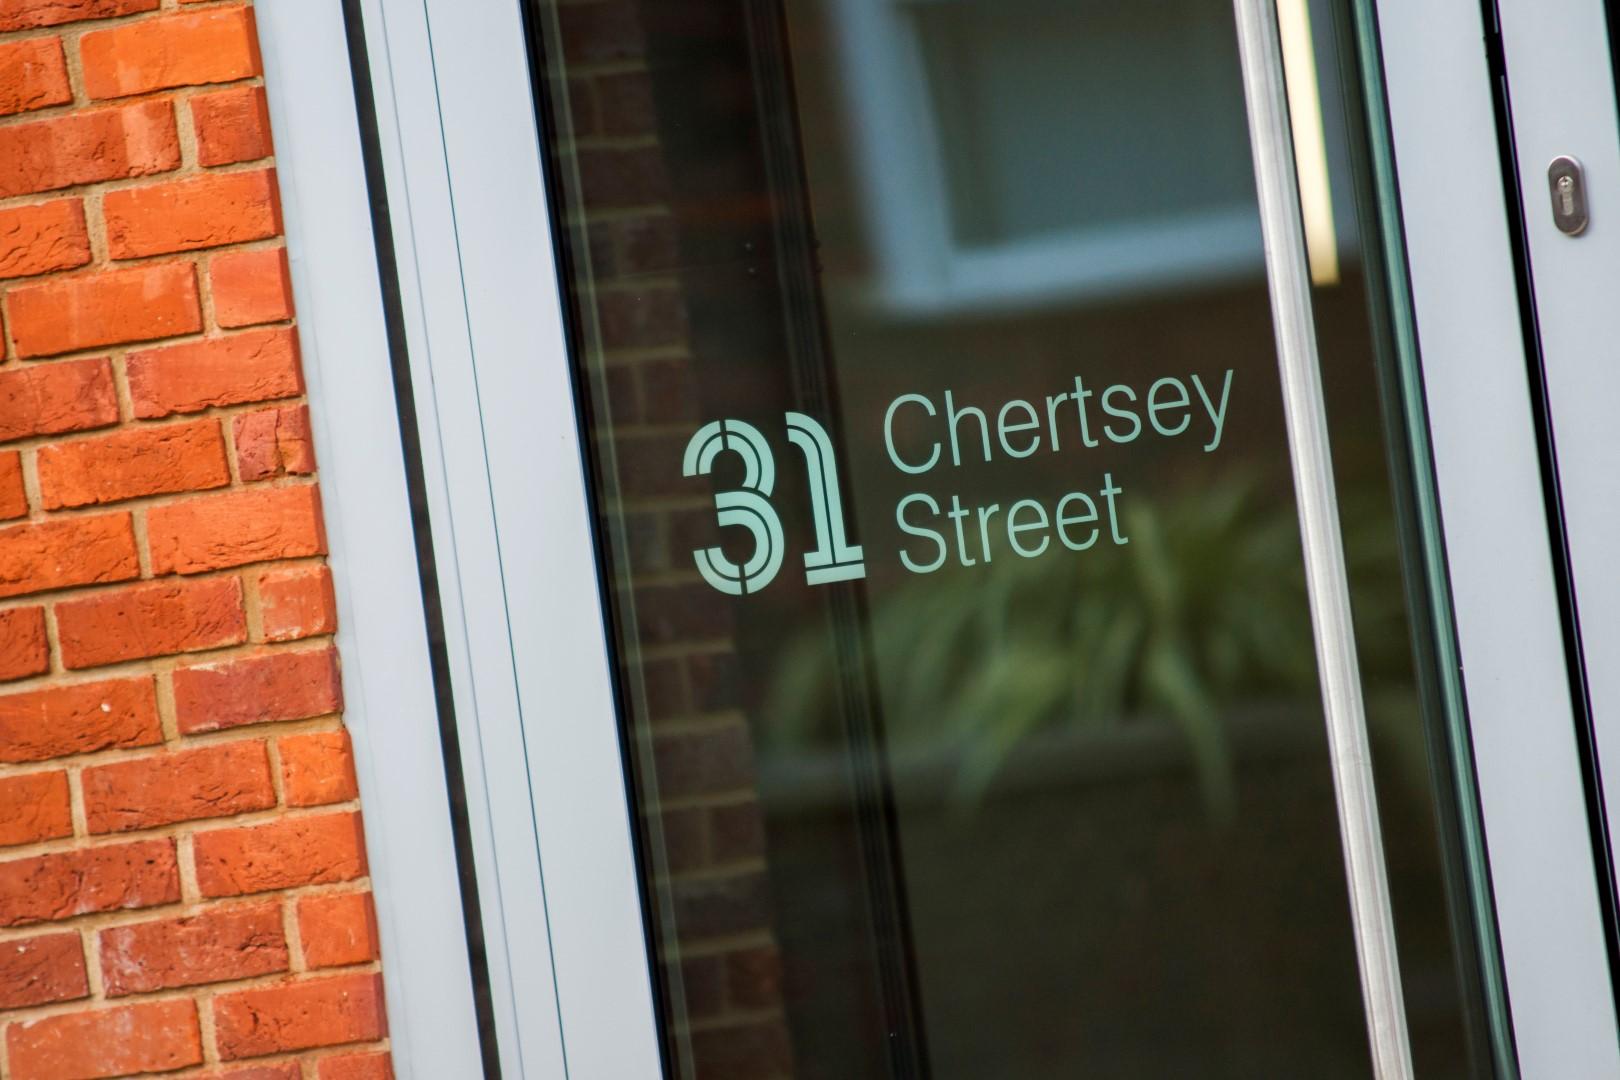 31 Chertsey Street (107).jpg